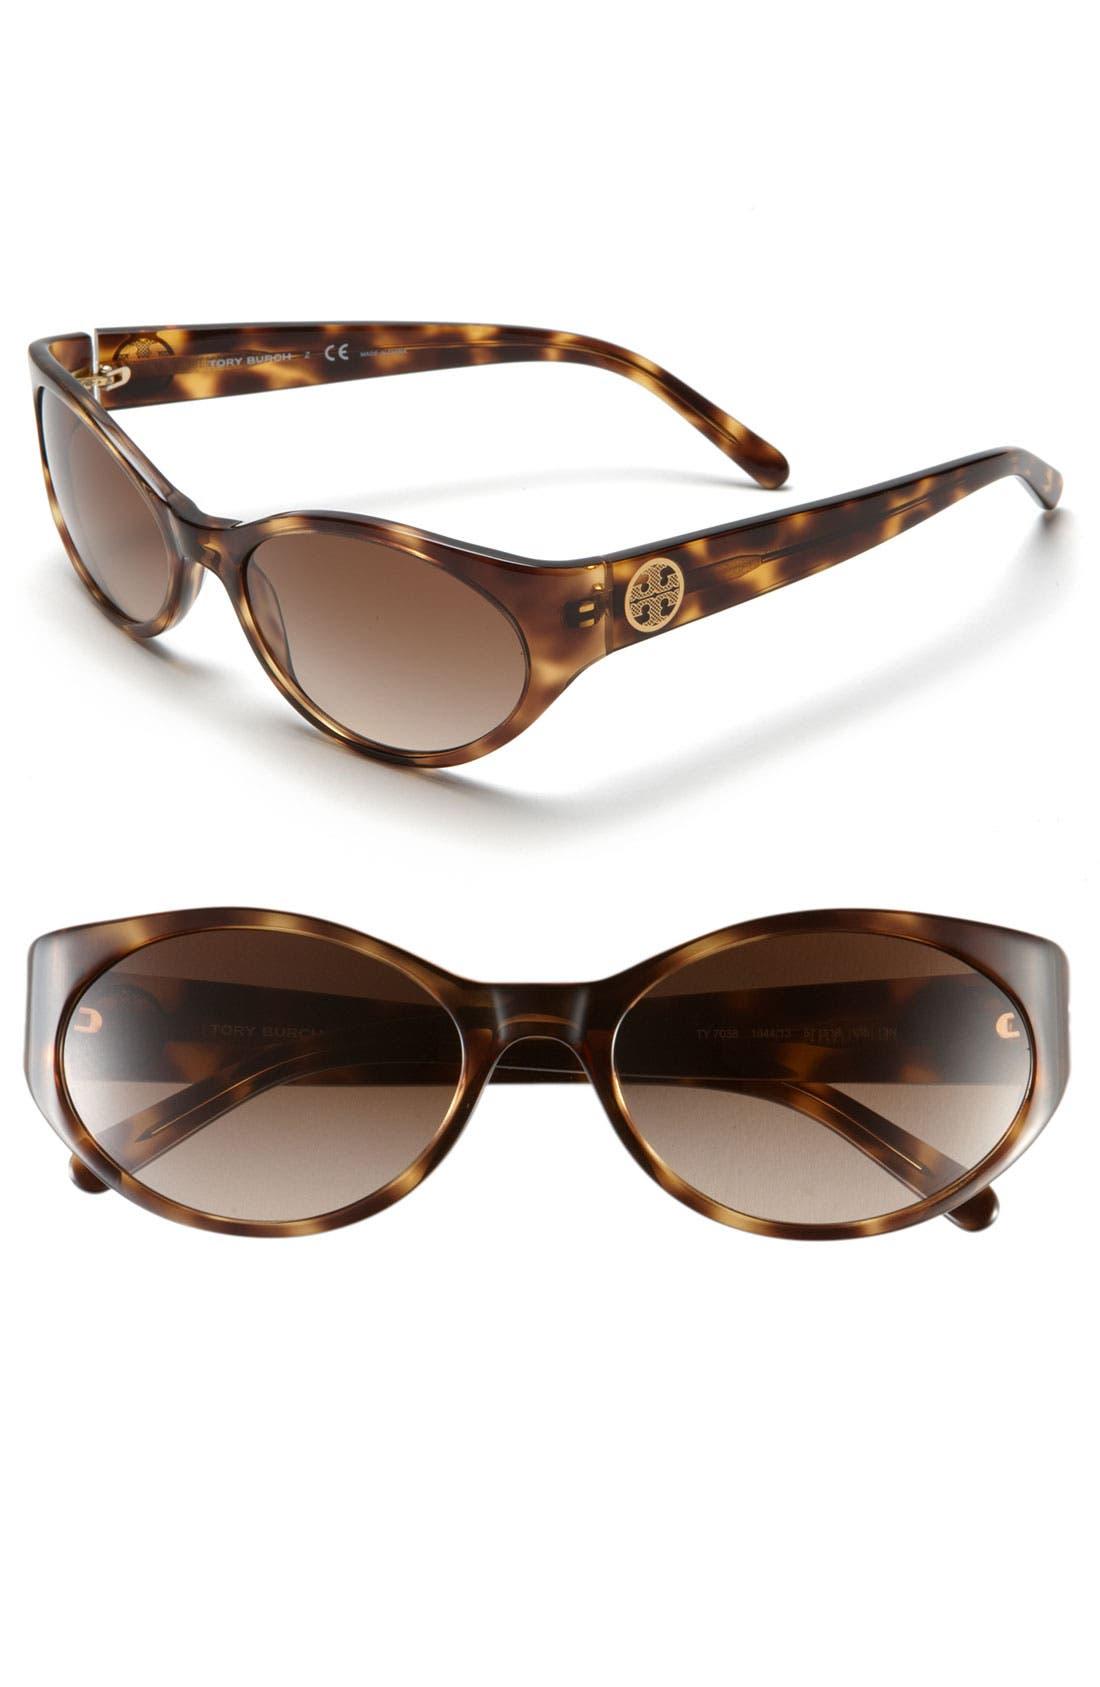 Main Image - Tory Burch 57mm Cat Eye Sunglasses